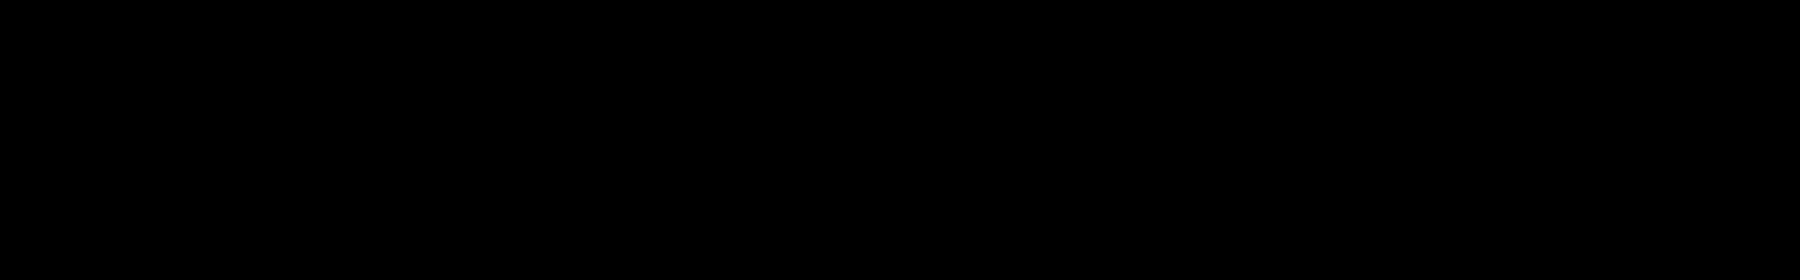 Cinematic Horror - CONSTRUCTION KIT audio waveform